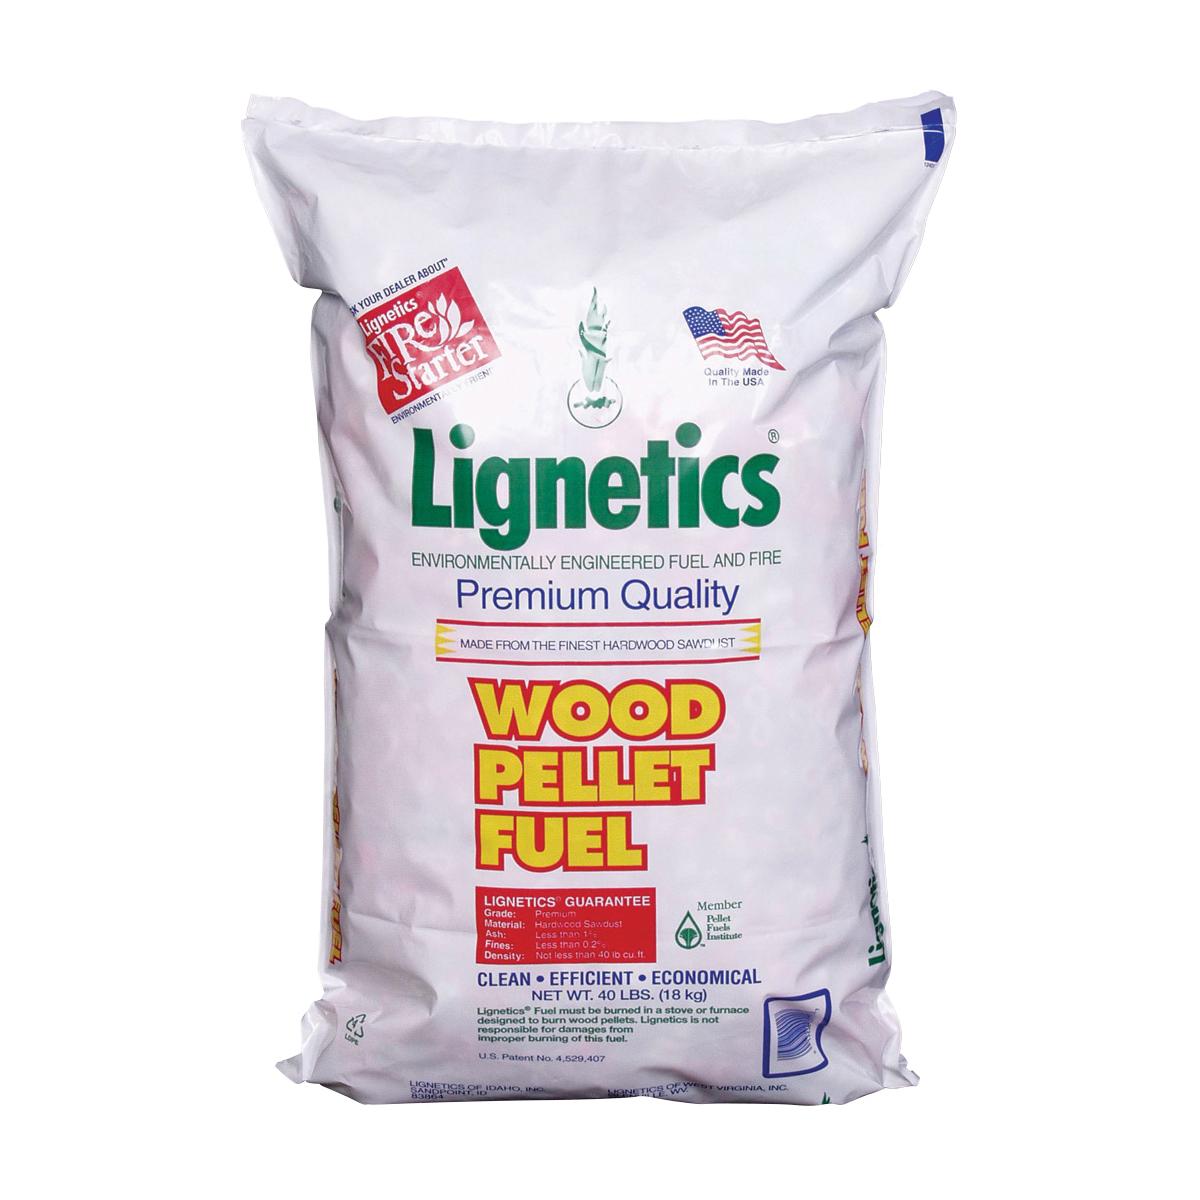 Picture of Lignetics FG10 Wood Fuel Pellet, 16 in L, 40 lb Package